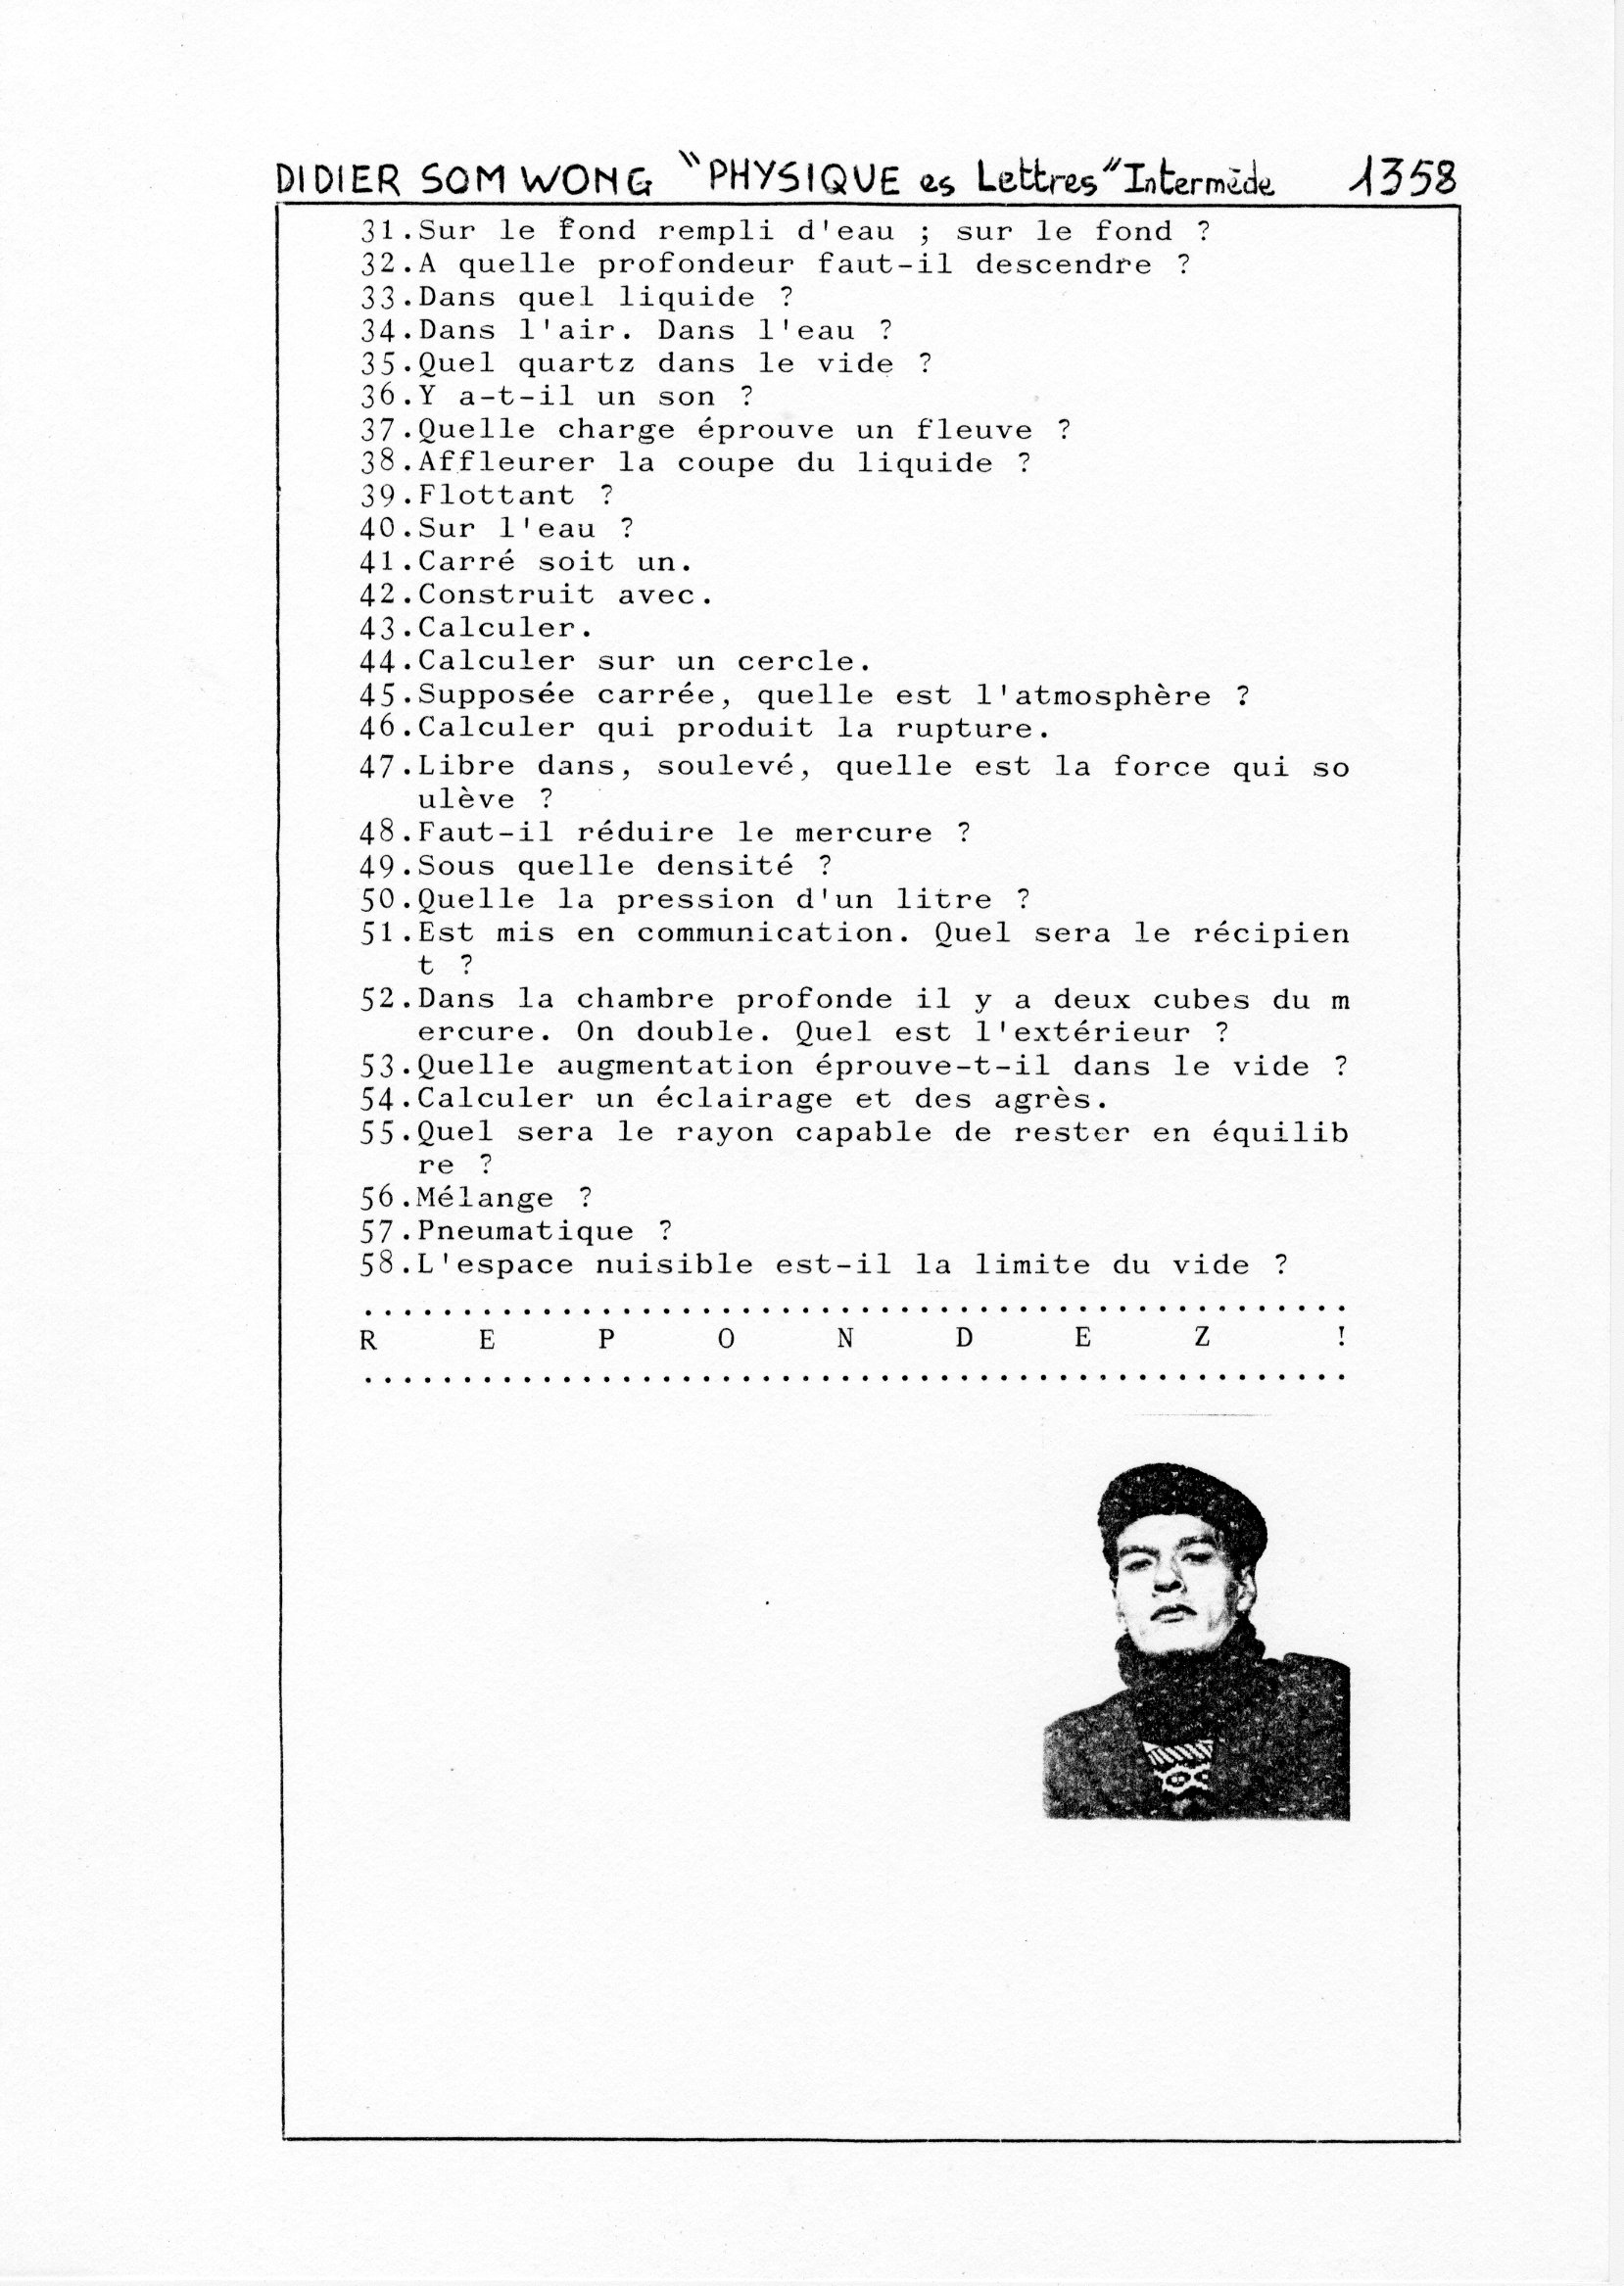 page 1358 D. Som Wong PHYSIQUE Es Lettres -Intermède-